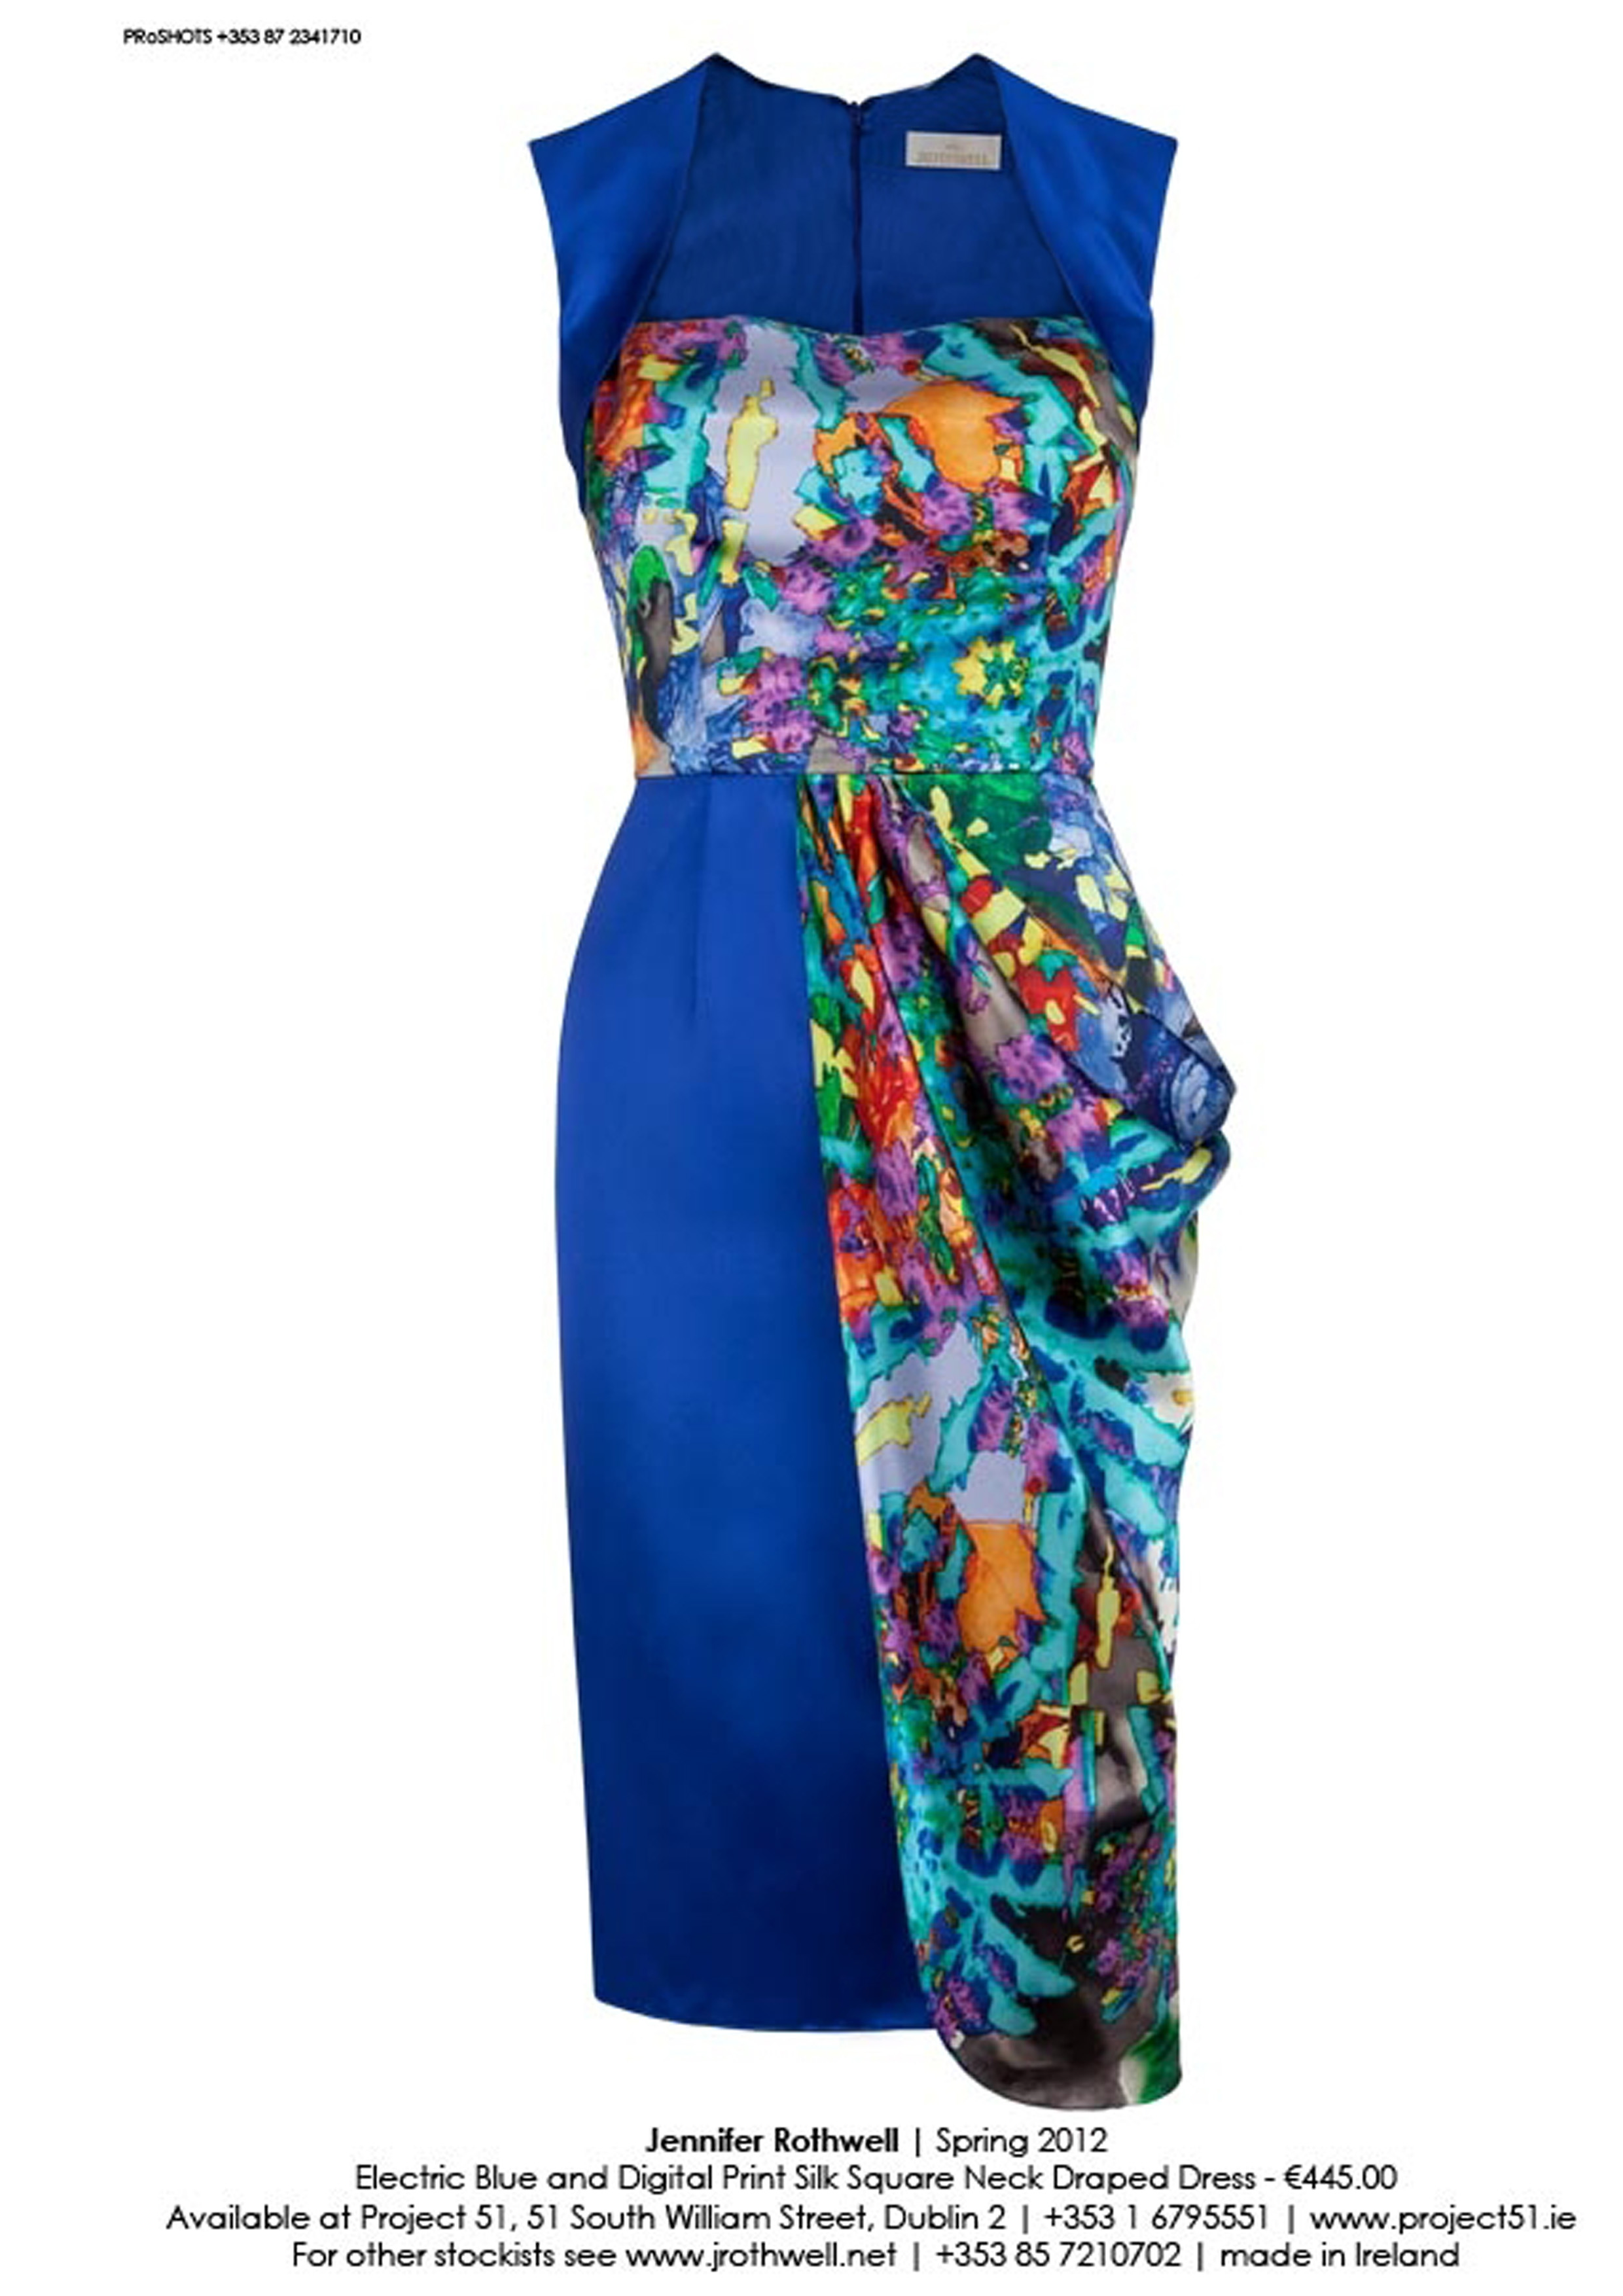 drape_side_dress.jpg